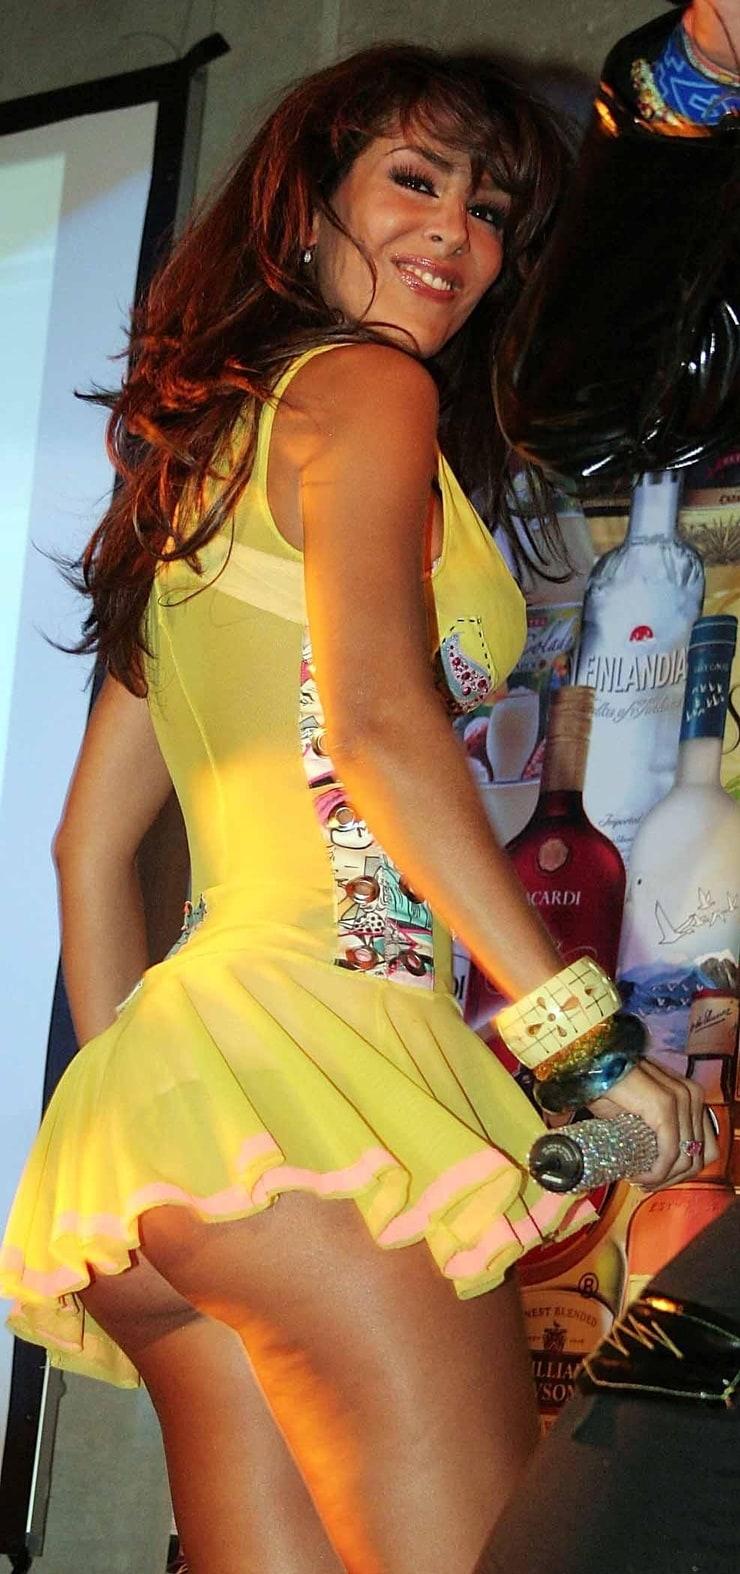 3 girls 300 upskirts party bare asses transparent dress 4k - 2 3